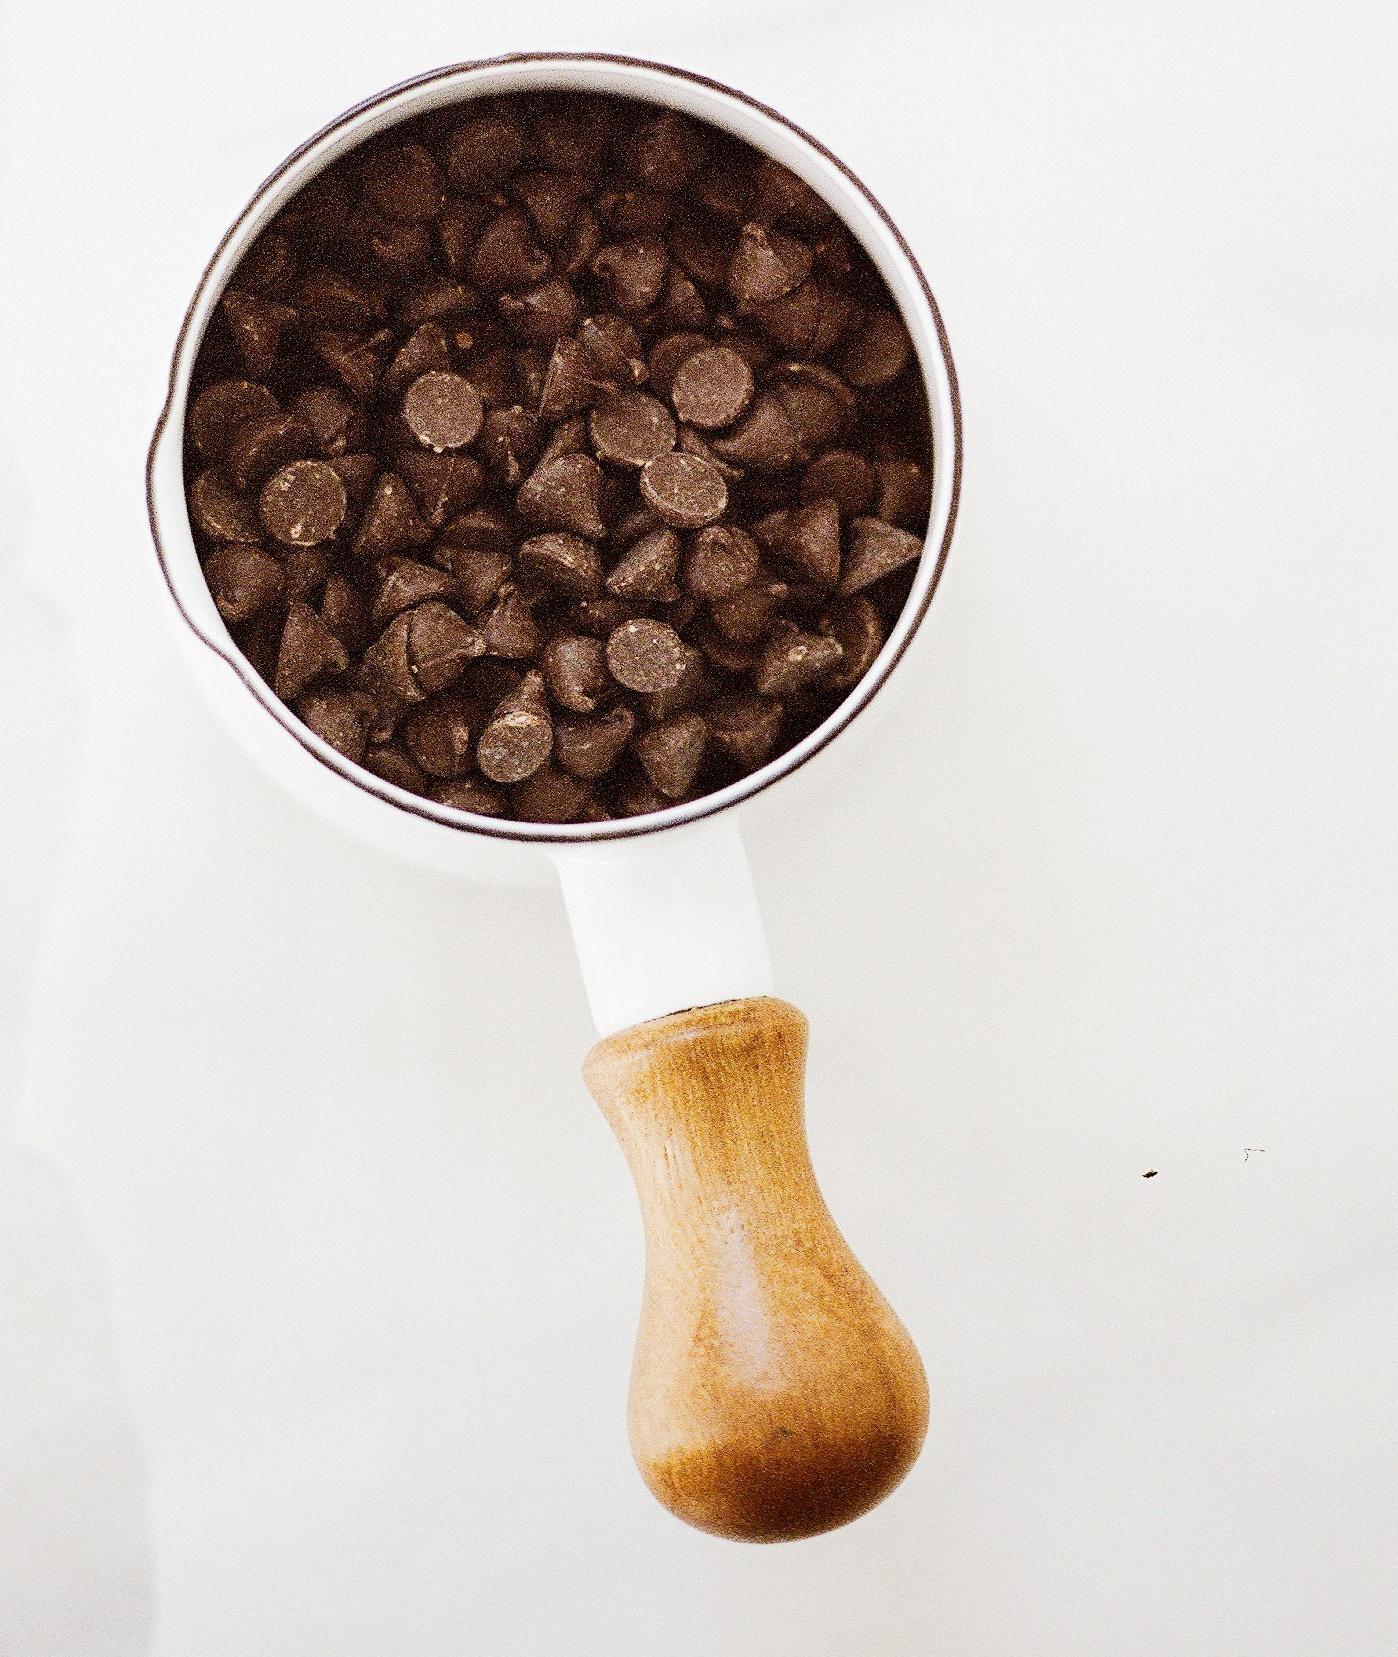 The Budtender's Review Corner: Kola Bear Farm's Triple Chocolate Chip Flower